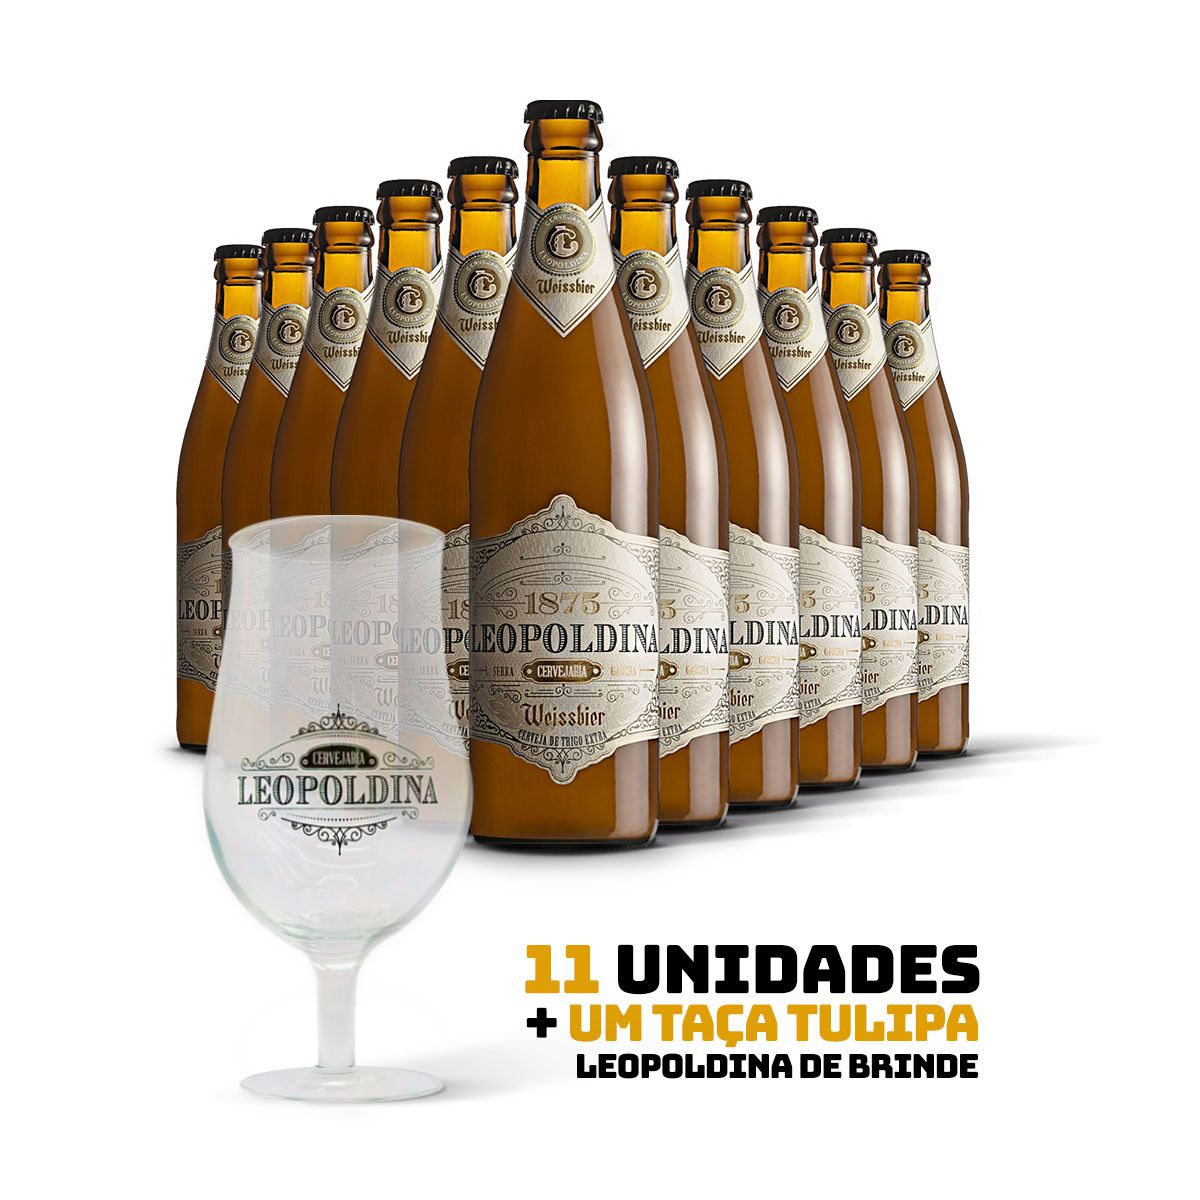 Kit Leopoldina Weissbier 500ml 11 cervejas + Brinde Taça Tulipa Leopoldina